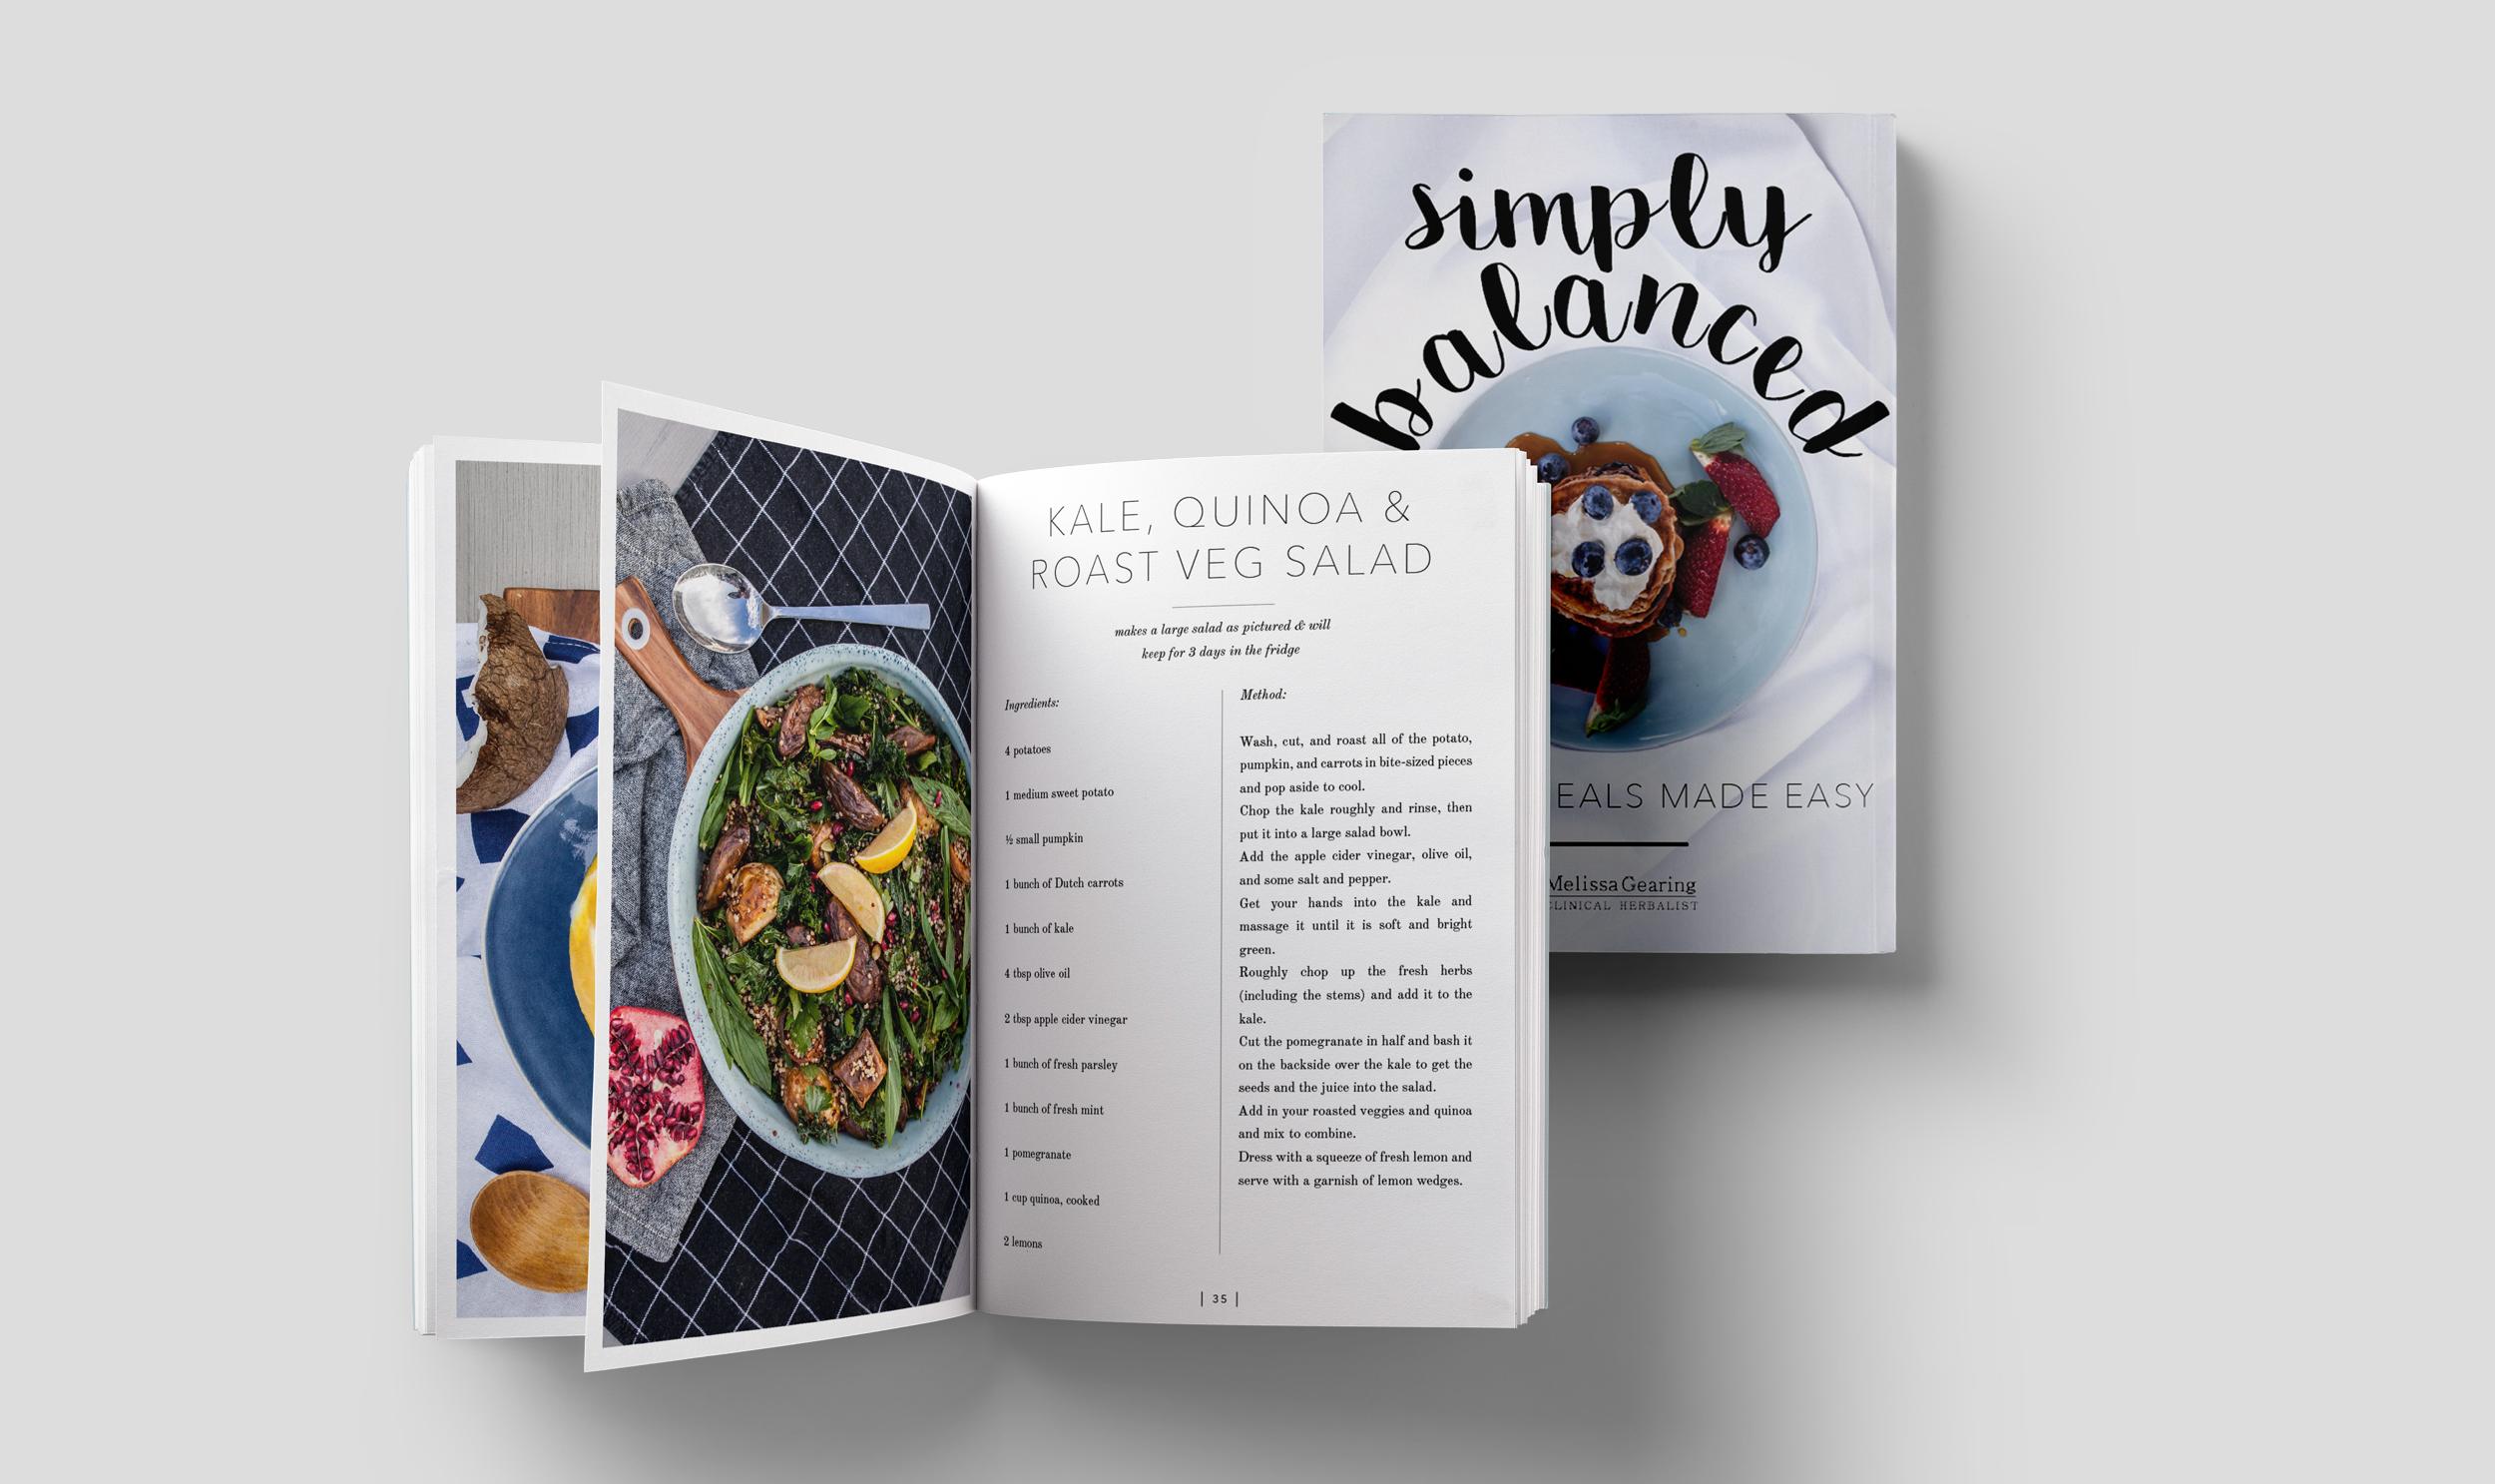 book mockup sb recipe.png